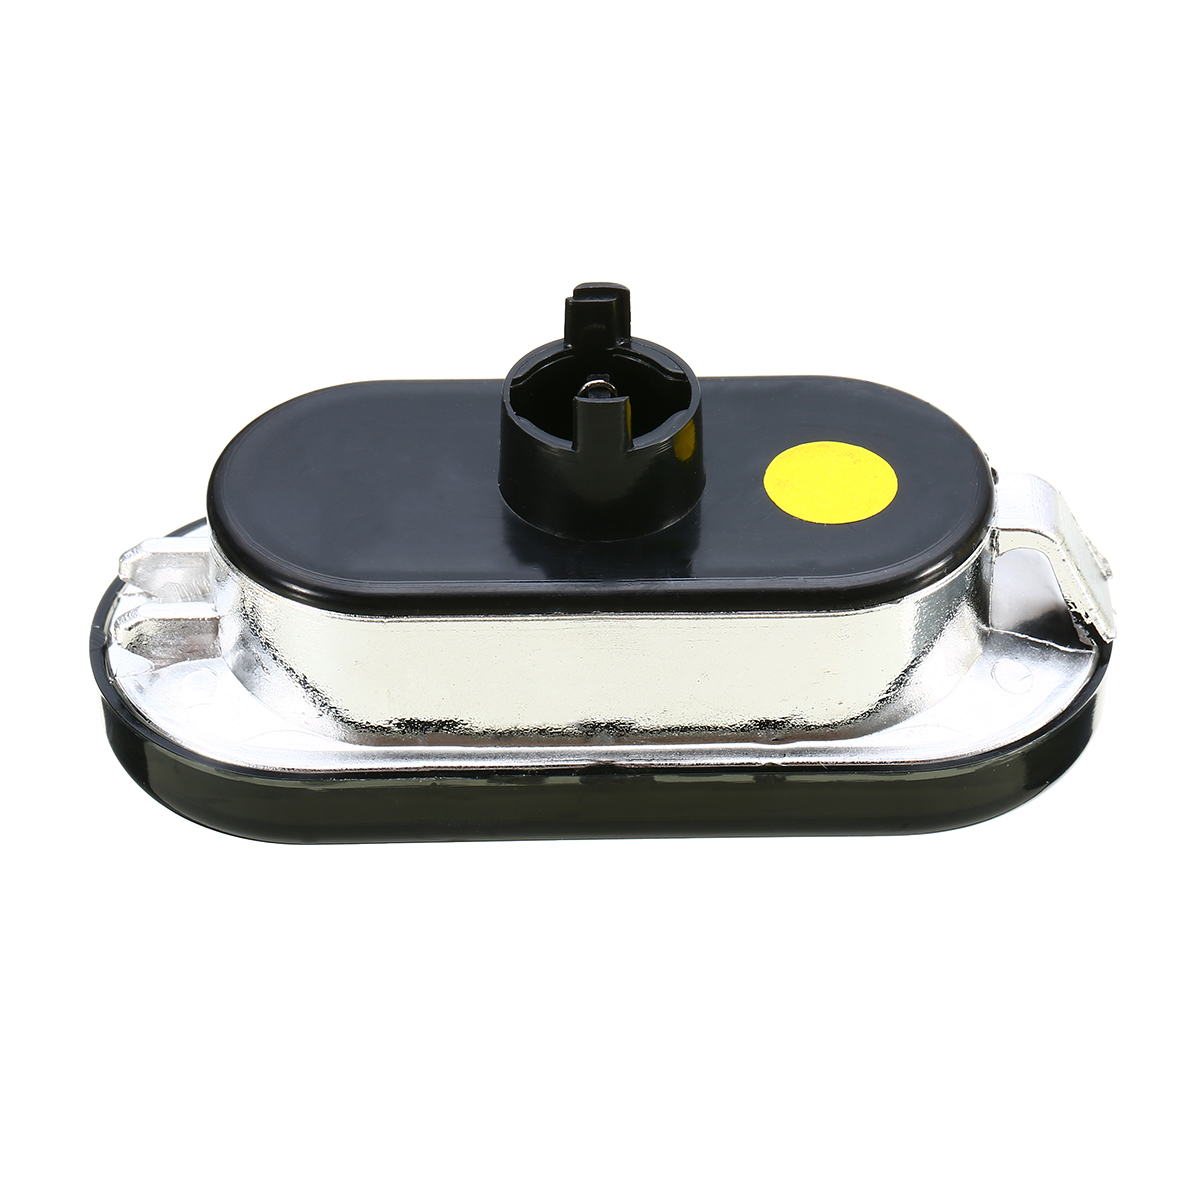 Car Singal Lamp 1Pair Car Amber LED Side Marker Lights Universal Replacement for VW Golf Jetta Bora MK4 Passat B5 B5.5